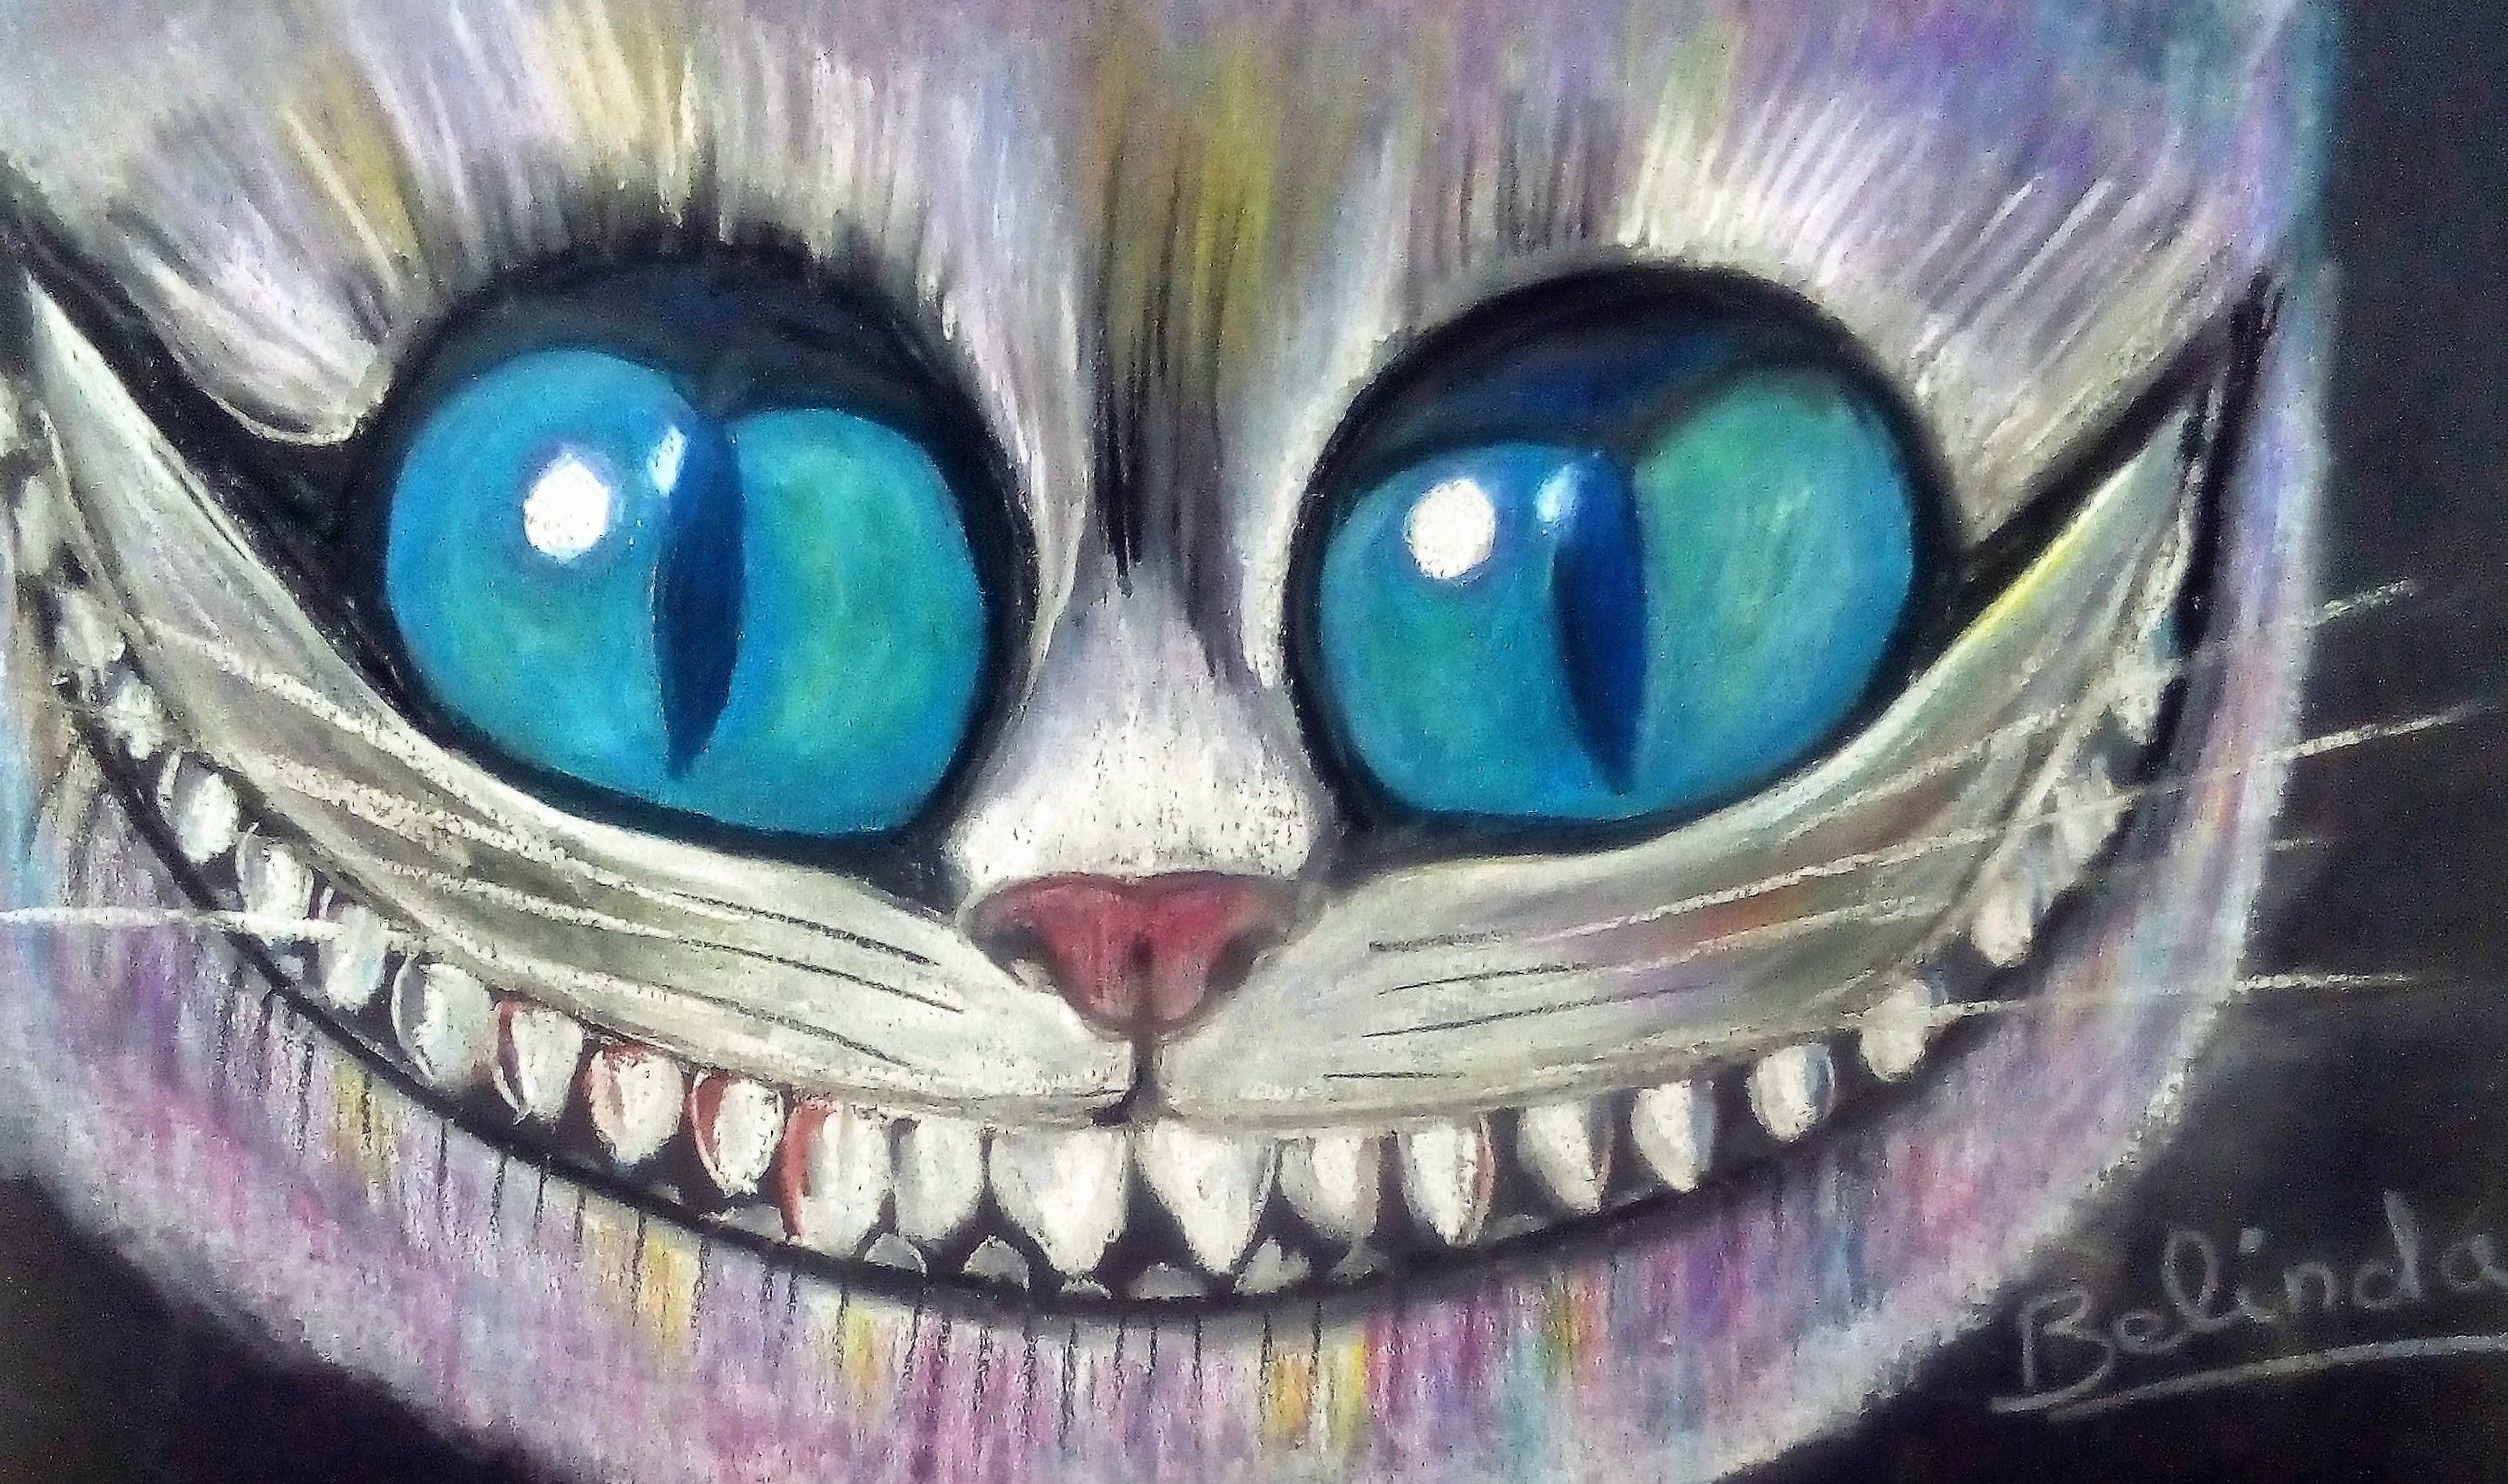 sonrisa-gato  sombrero-gato  Alicia-país-maravillas  f163a4dc4c0